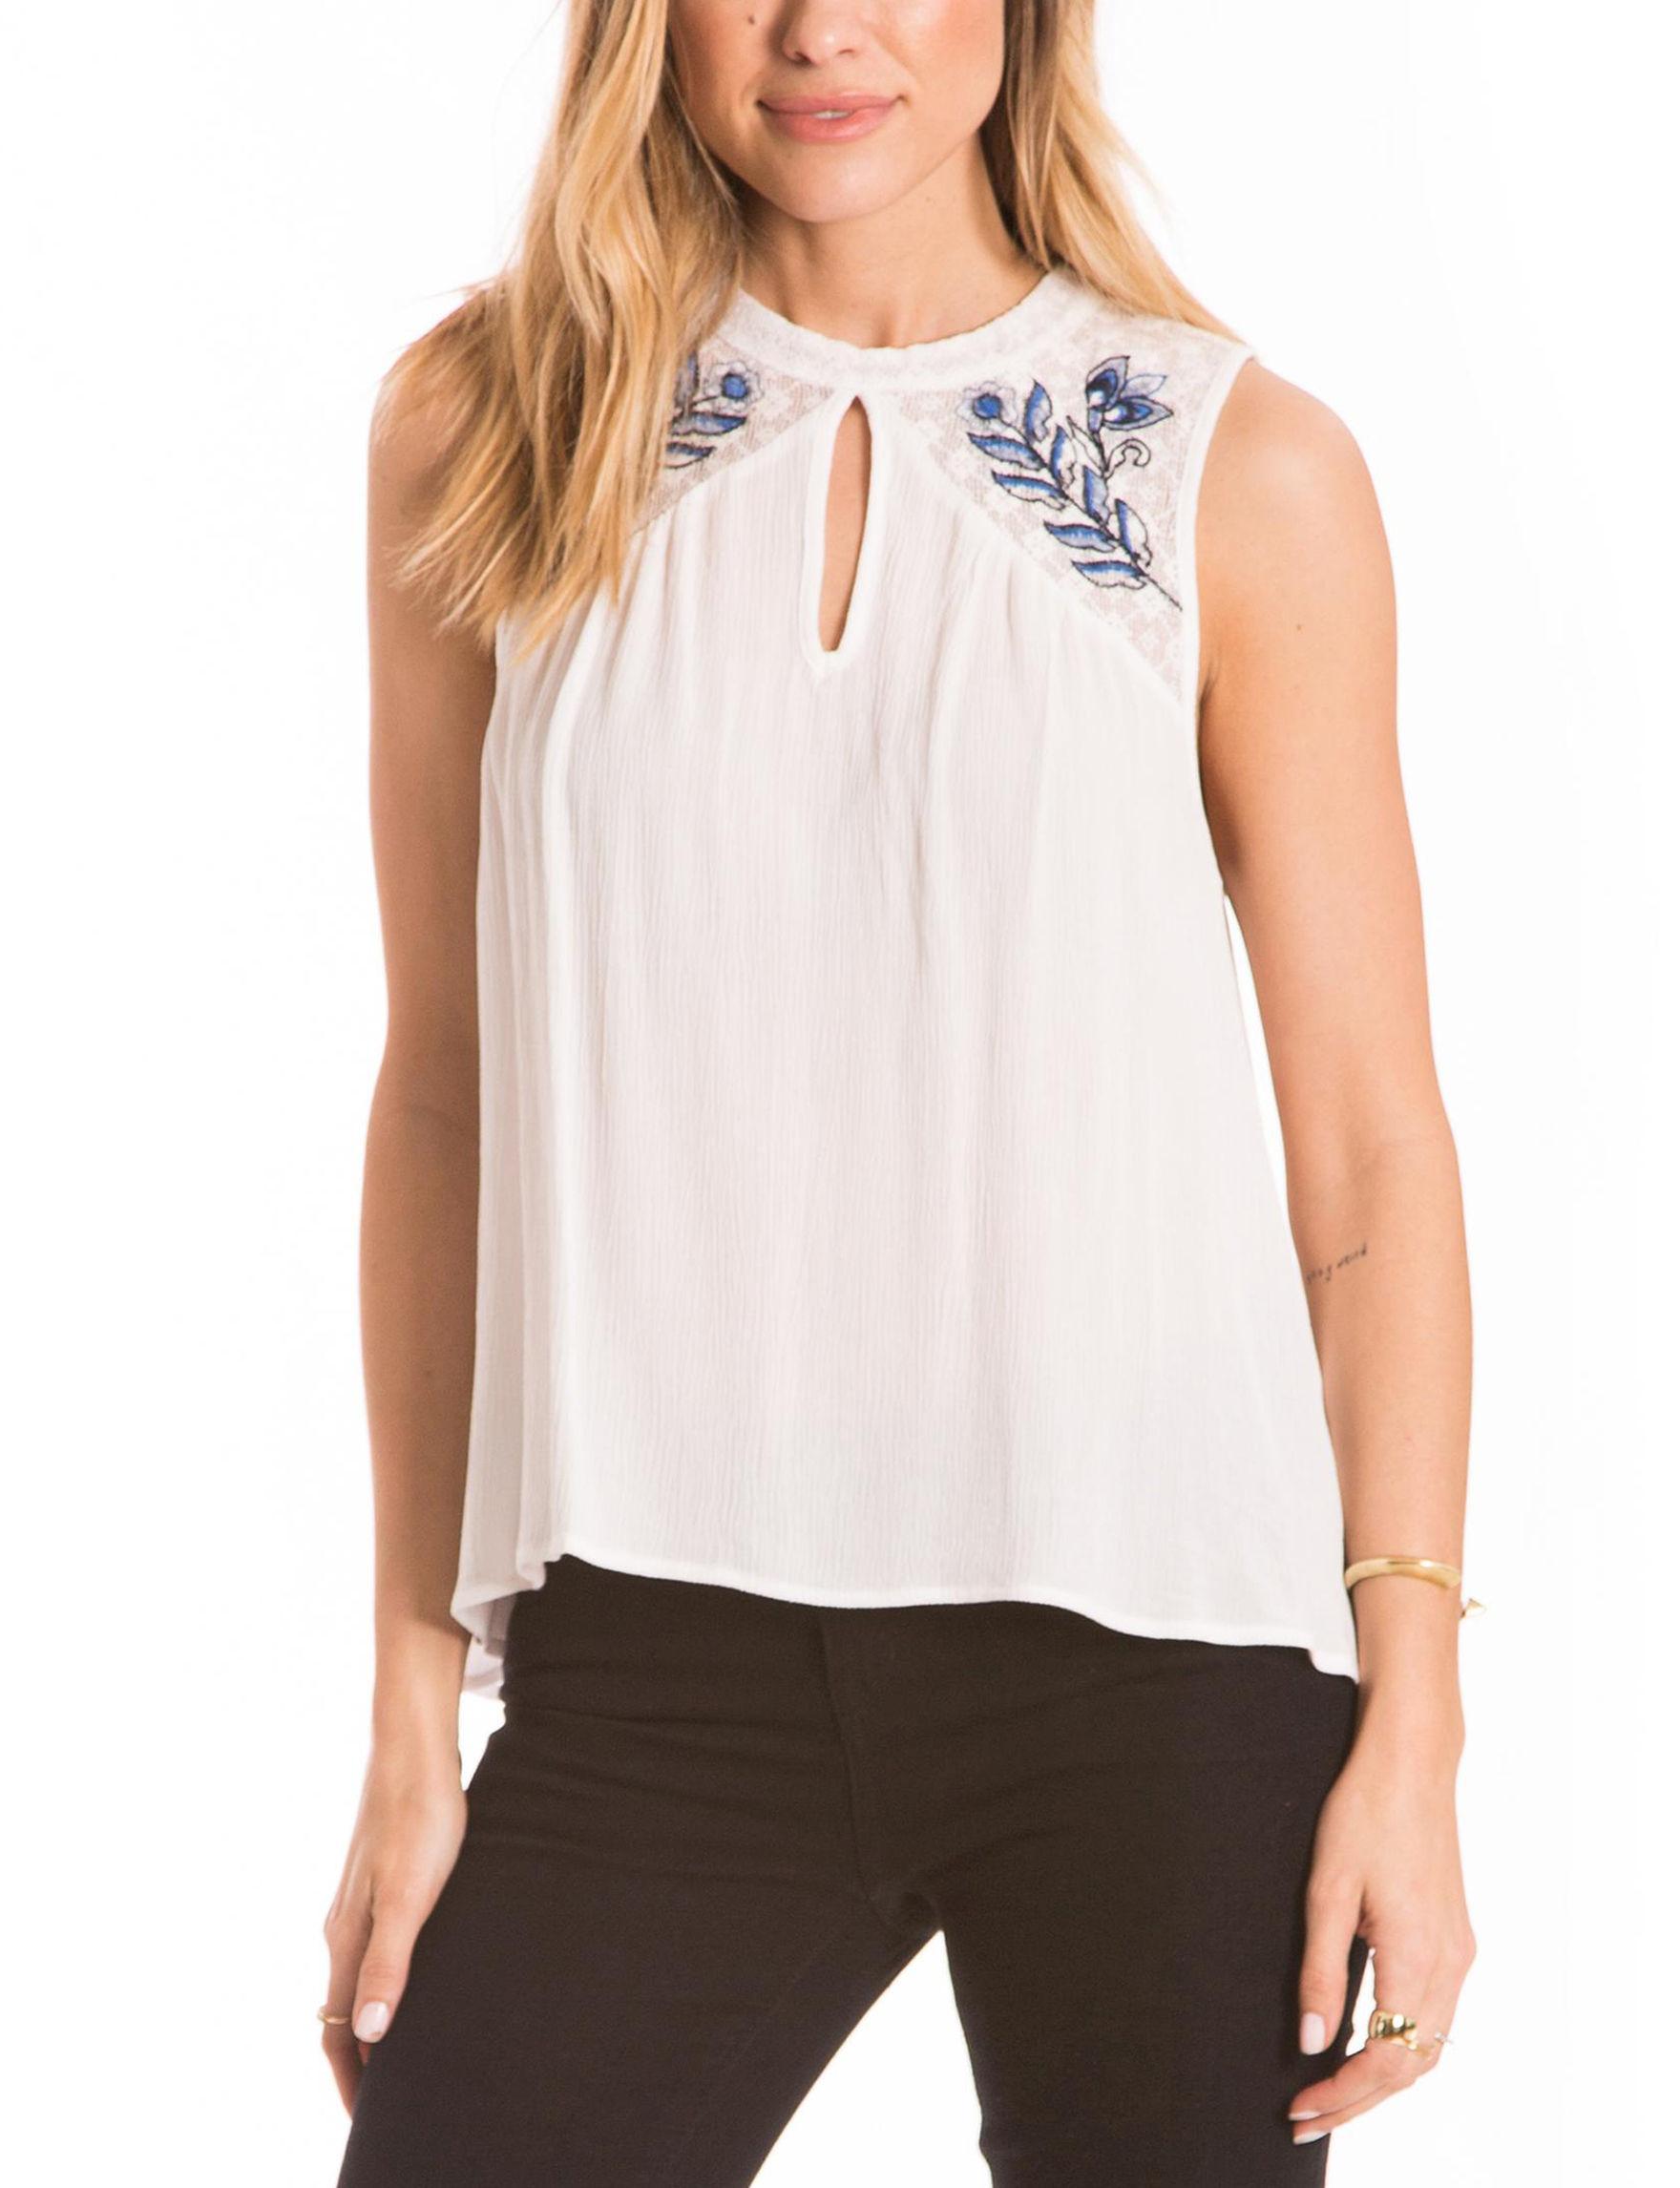 Eyeshadow White Shirts & Blouses Tees & Tanks